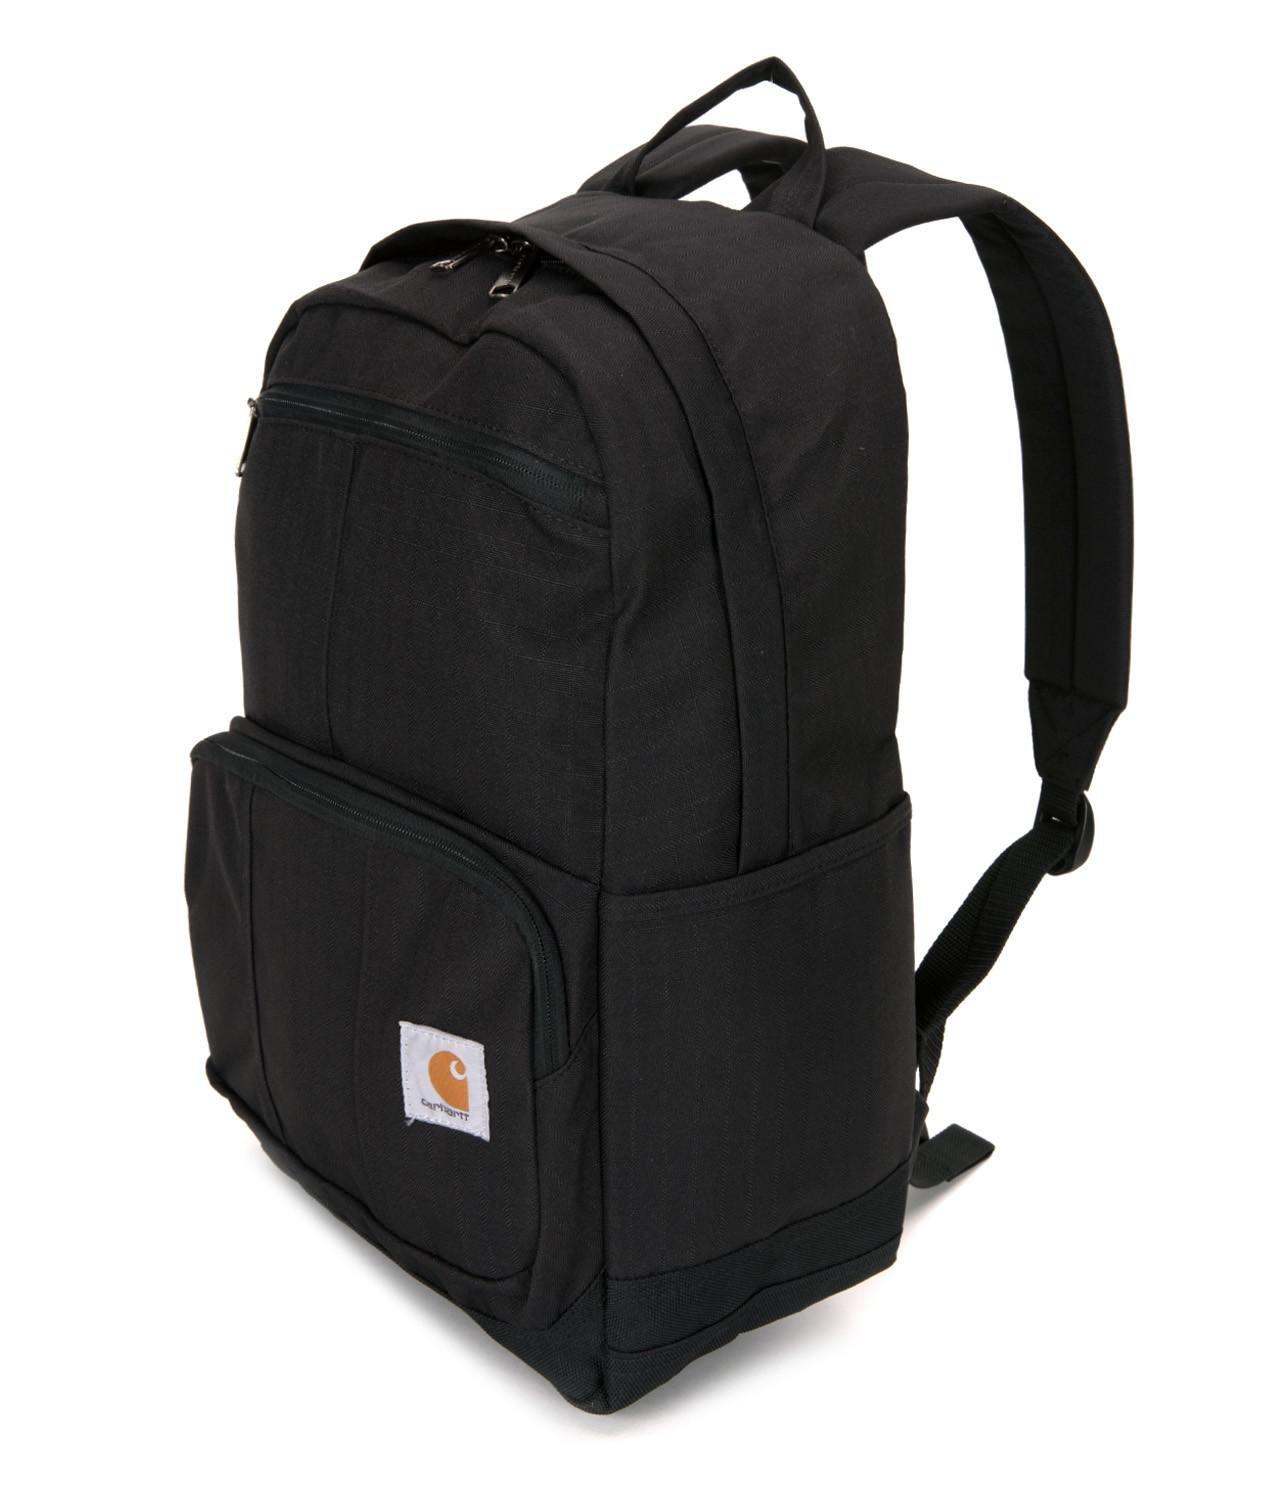 9d7575f808 Carhartt D89 Backpack-water Repellent Backpack in Black for Men - Lyst